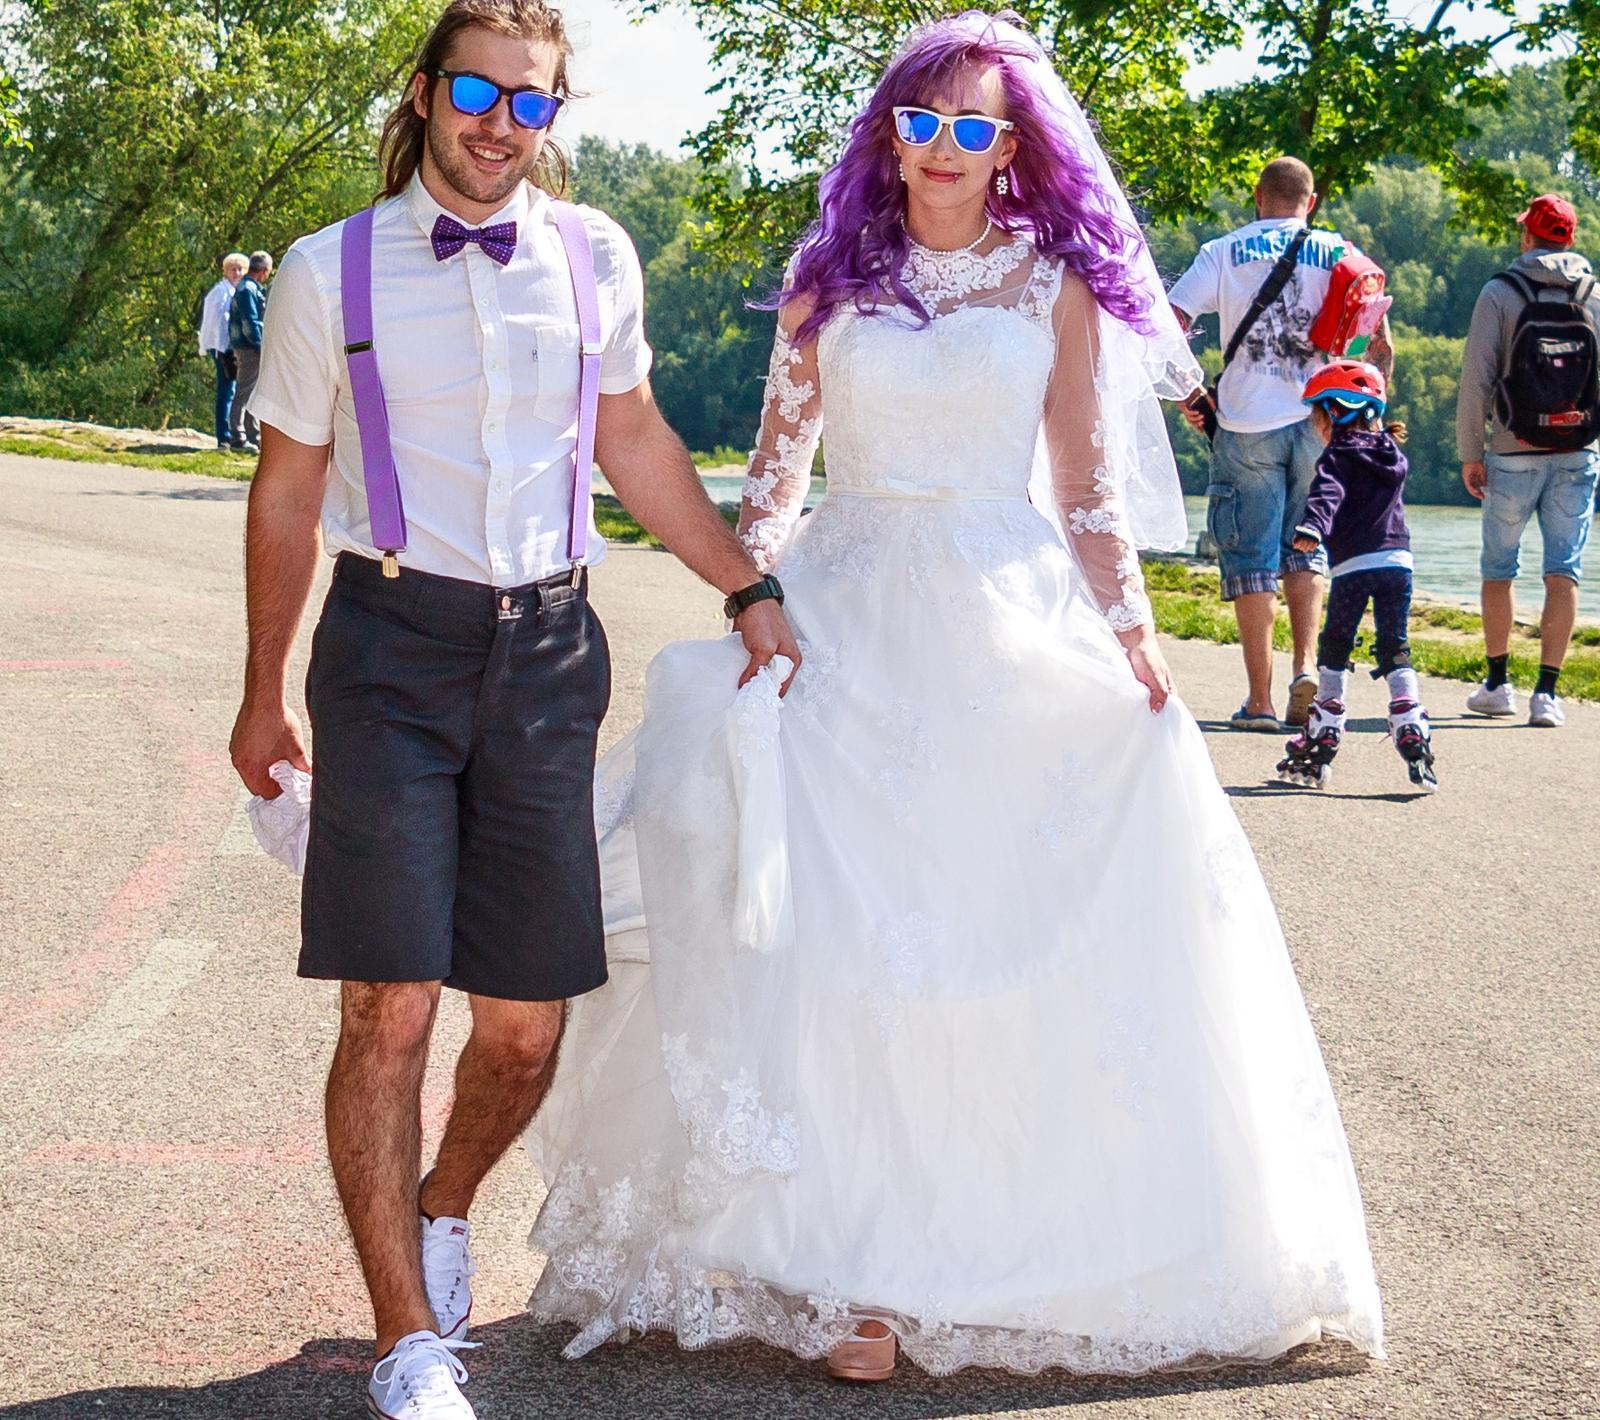 Nadherne svadobne saty - Obrázok č. 4